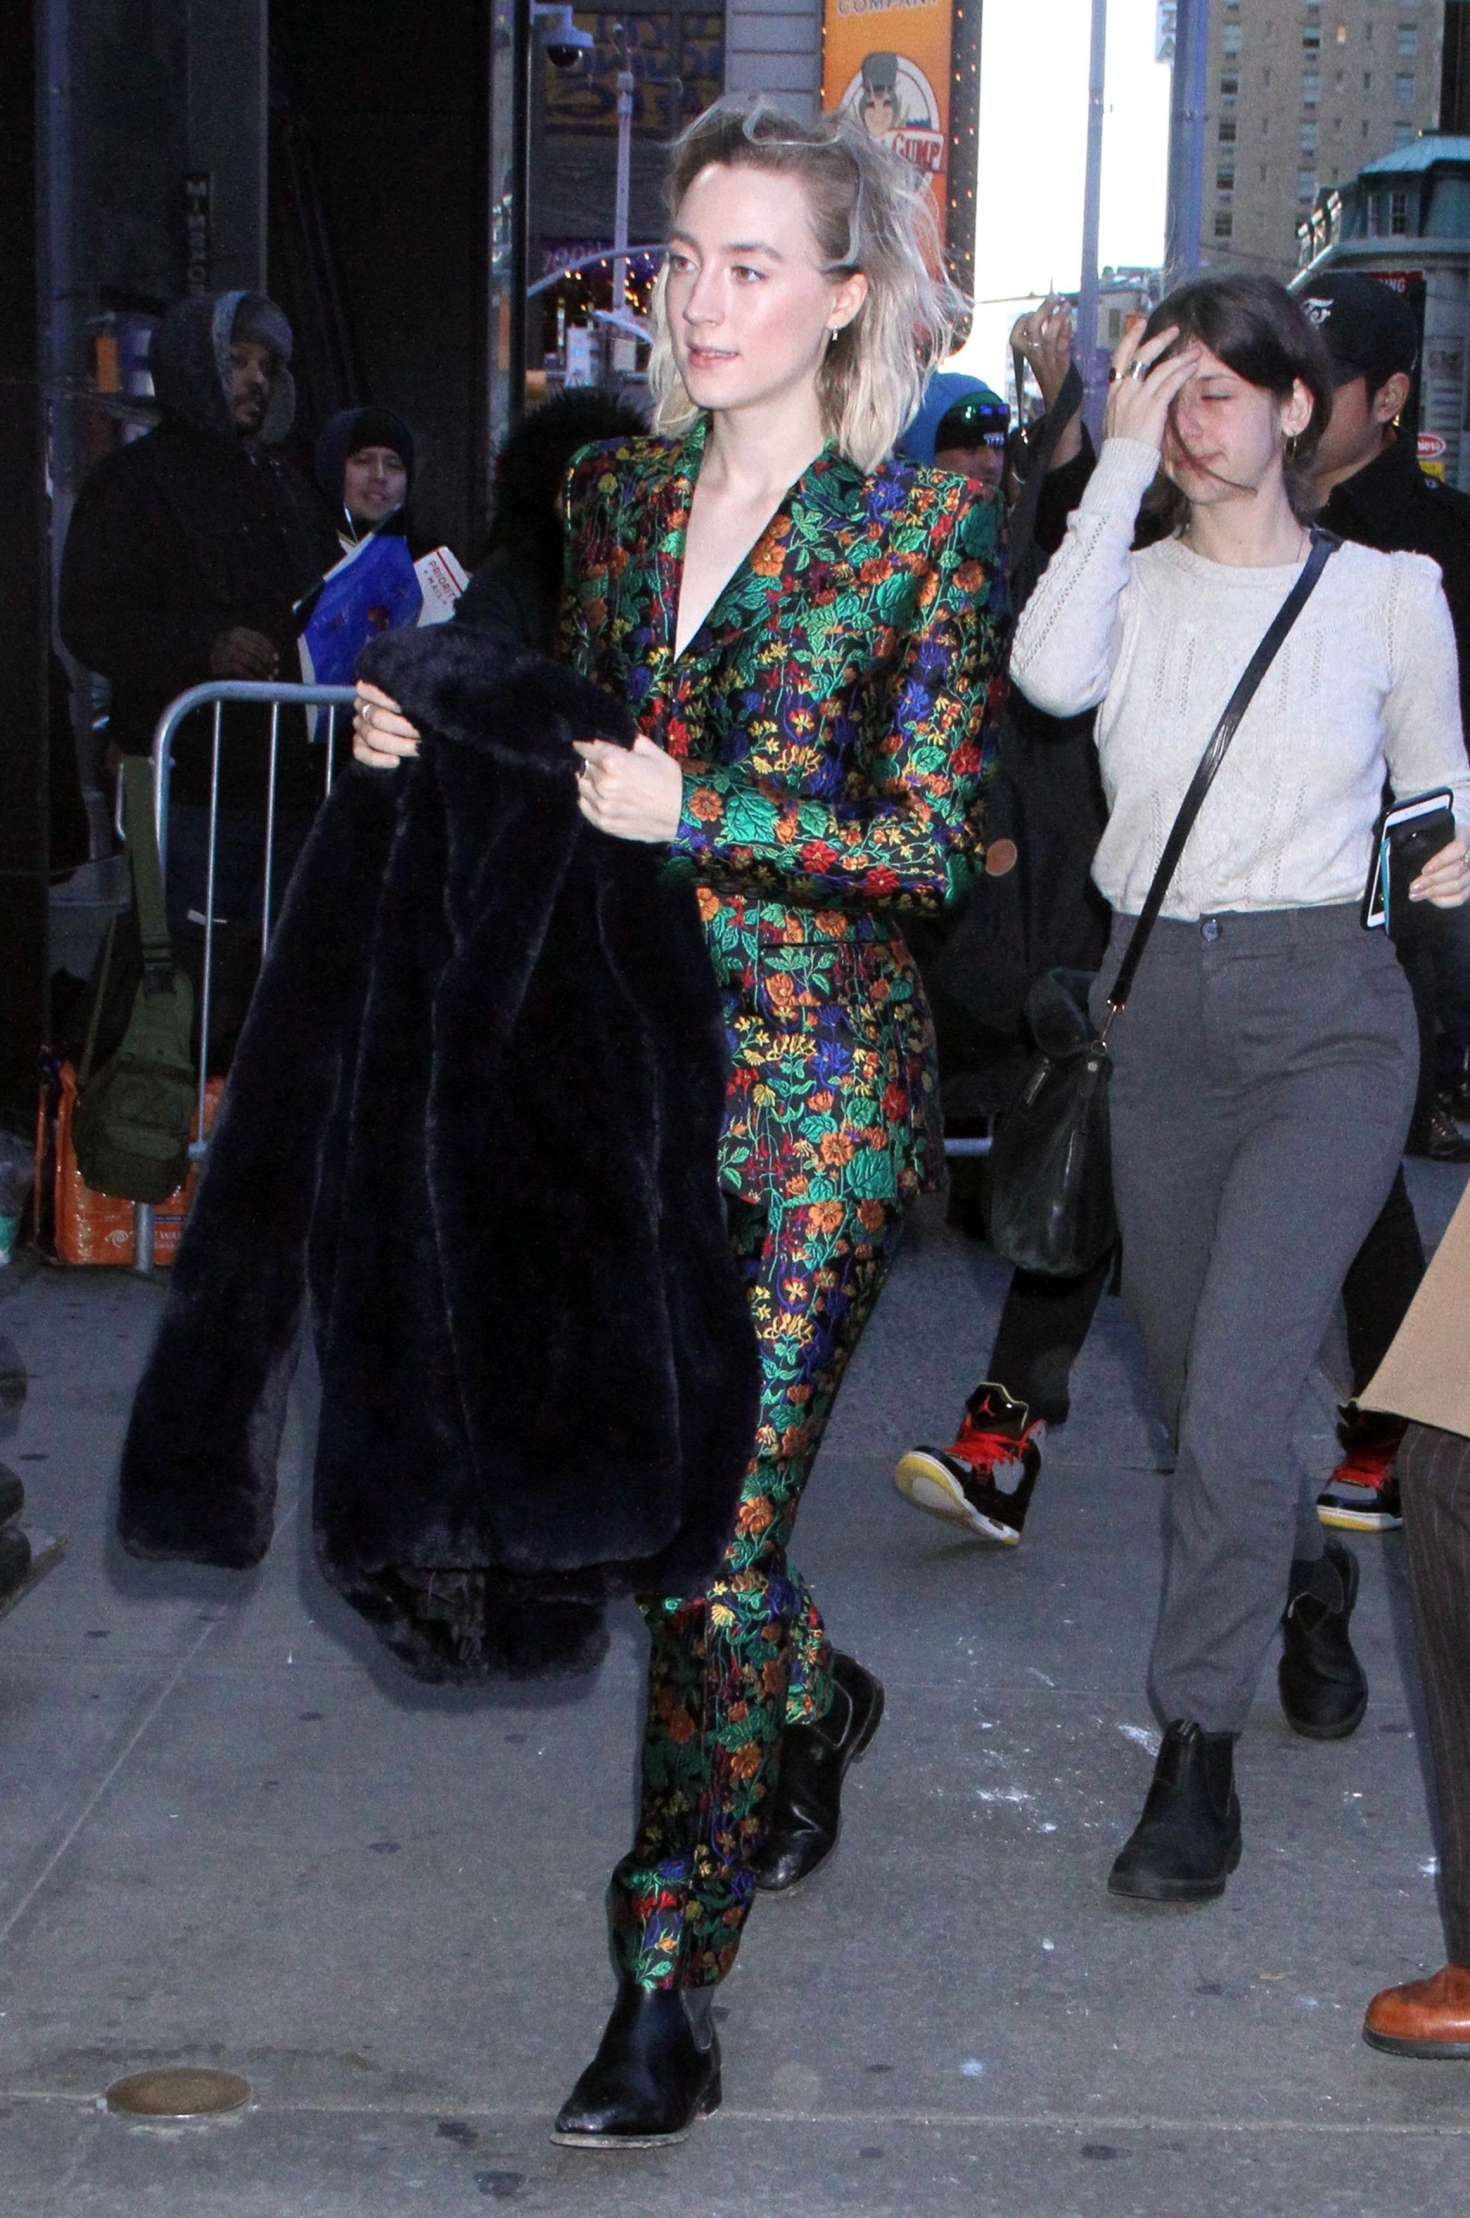 Saoirse Ronan - Arrives at 'Good Morning America' in NYC